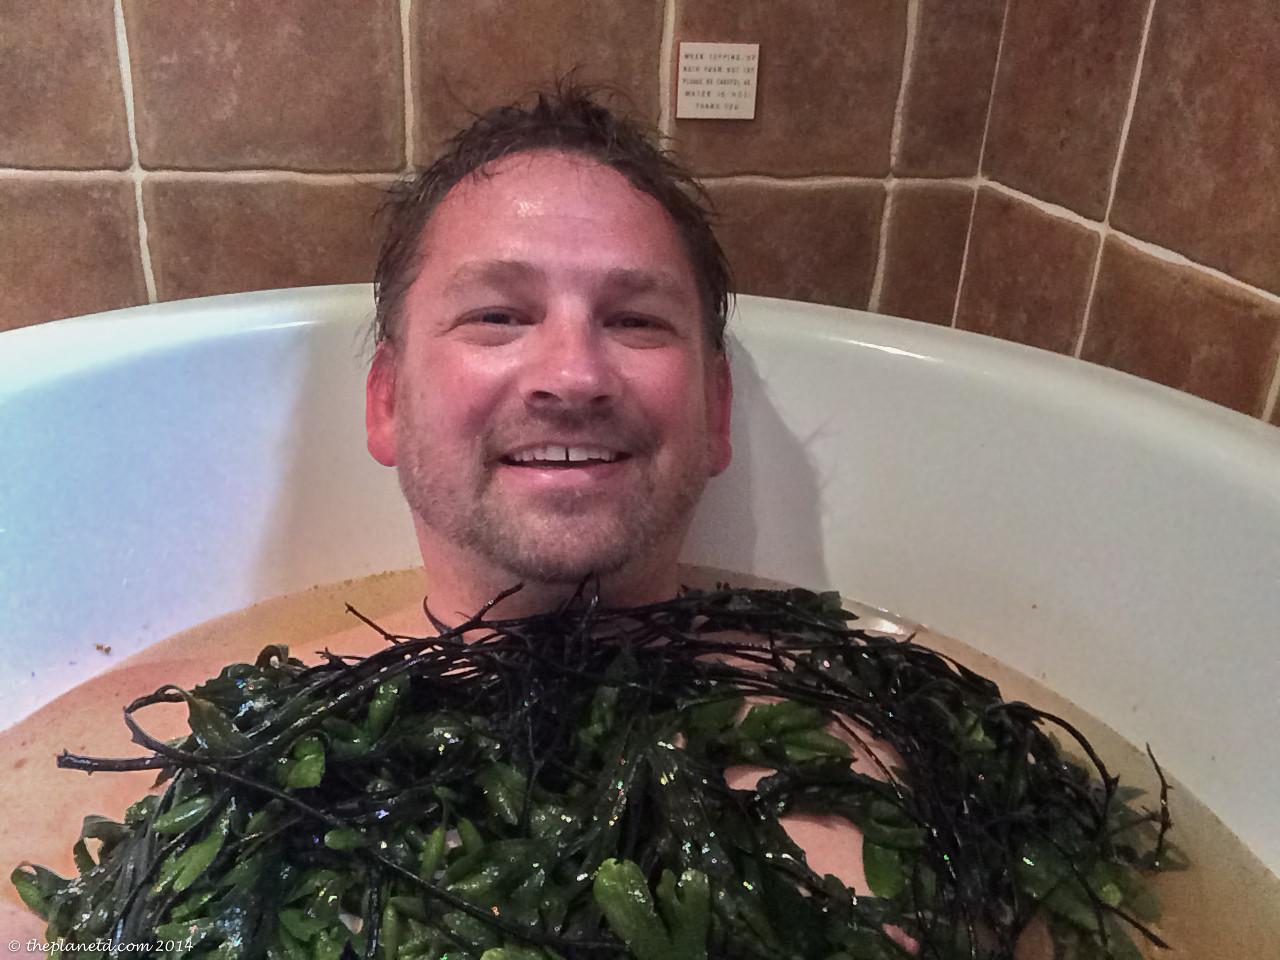 Taking a Seaweed bath in Ireland